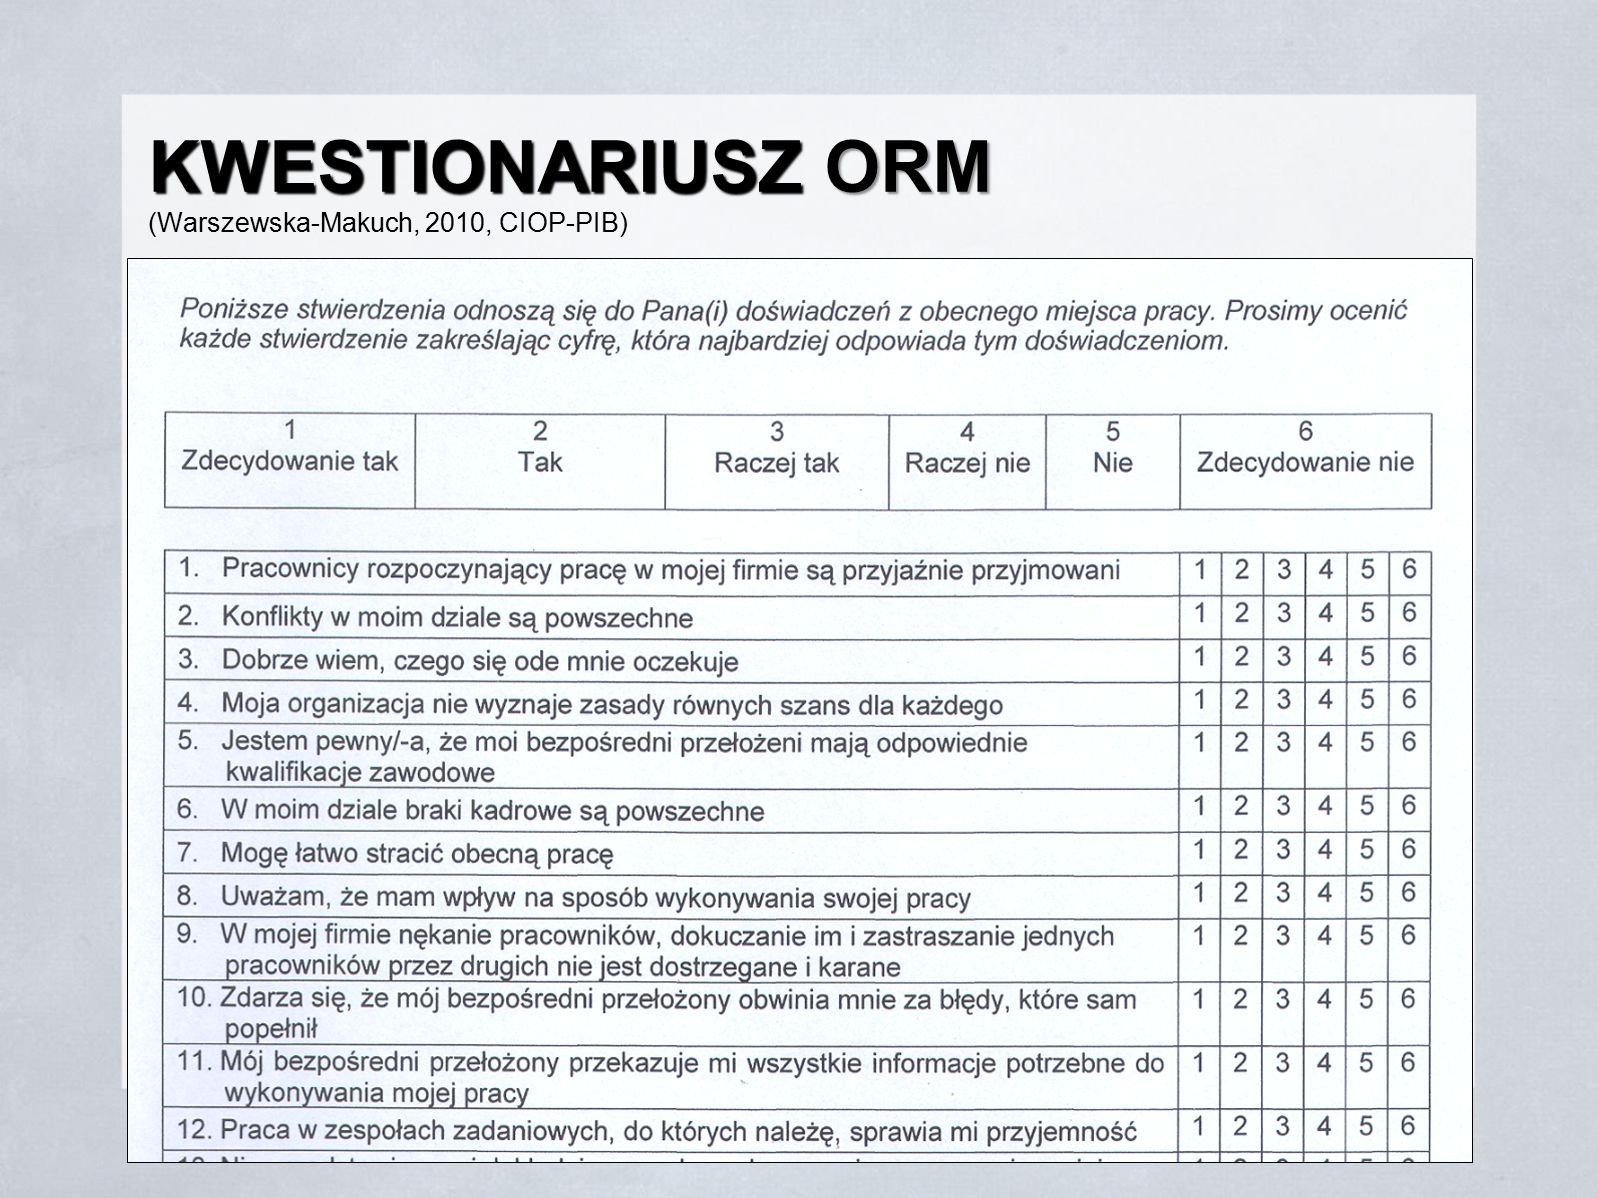 KWESTIONARIUSZ ORM KWESTIONARIUSZ ORM (Warszewska-Makuch, 2010, CIOP-PIB)